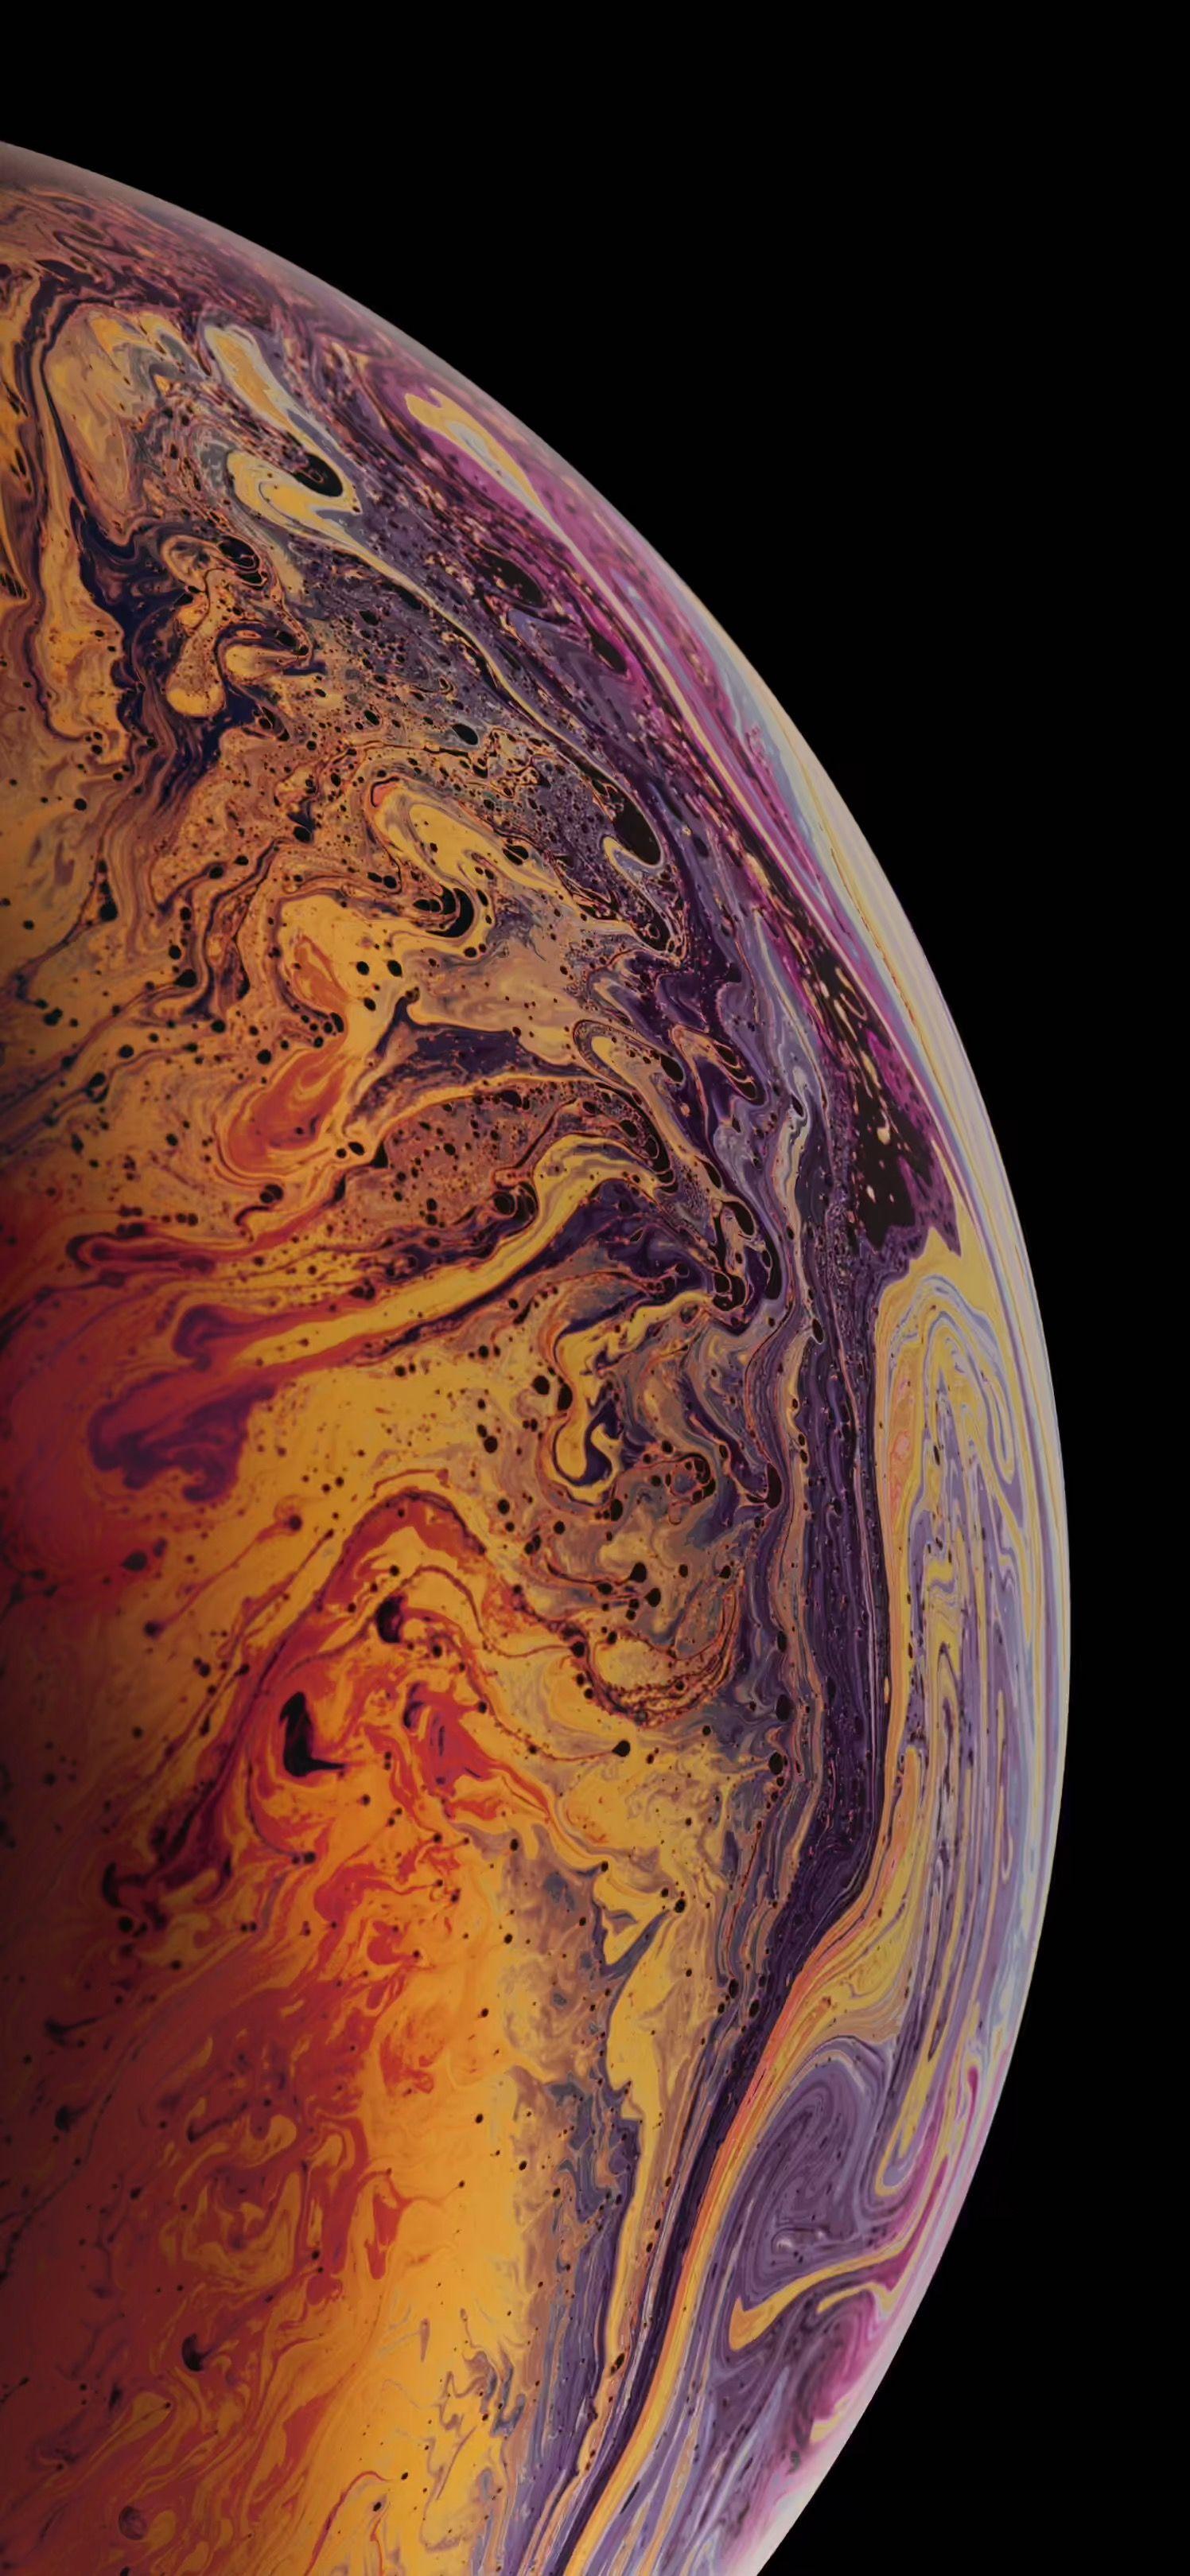 original iphone x xs wallpaper apple iphone xs max wallpaper